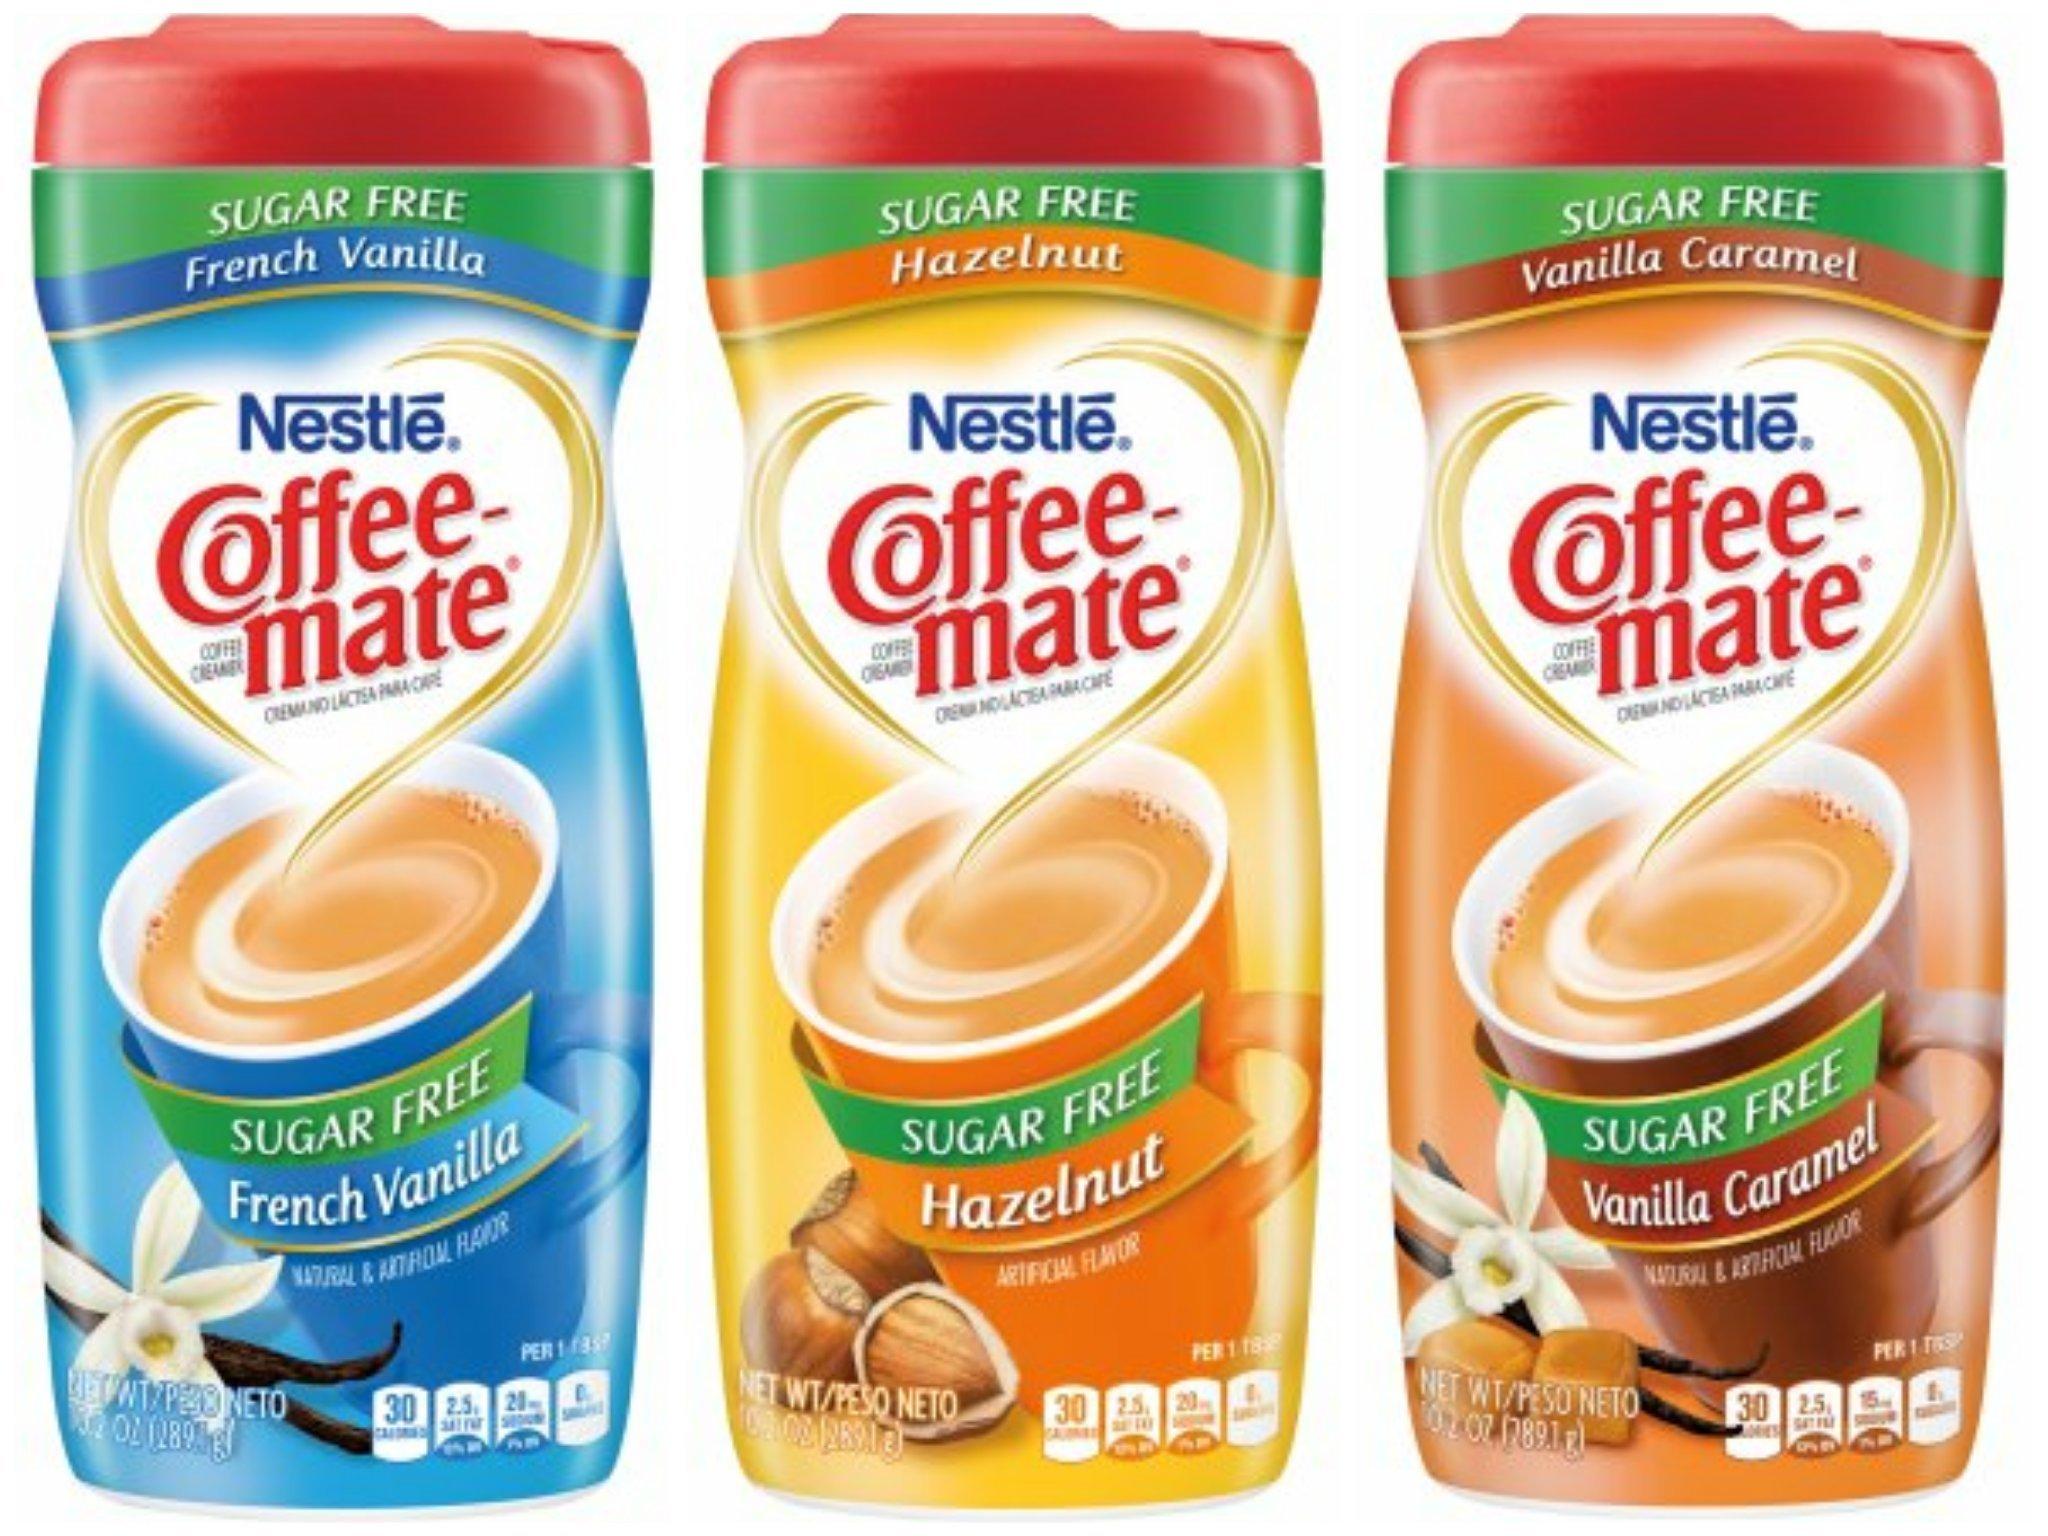 Nestle Coffee-mate Sugar Free French Vanilla, Hazelnuet & Vanilla Caramel Coffee Creamers - 10.2 oz. Canisters (6 pack)